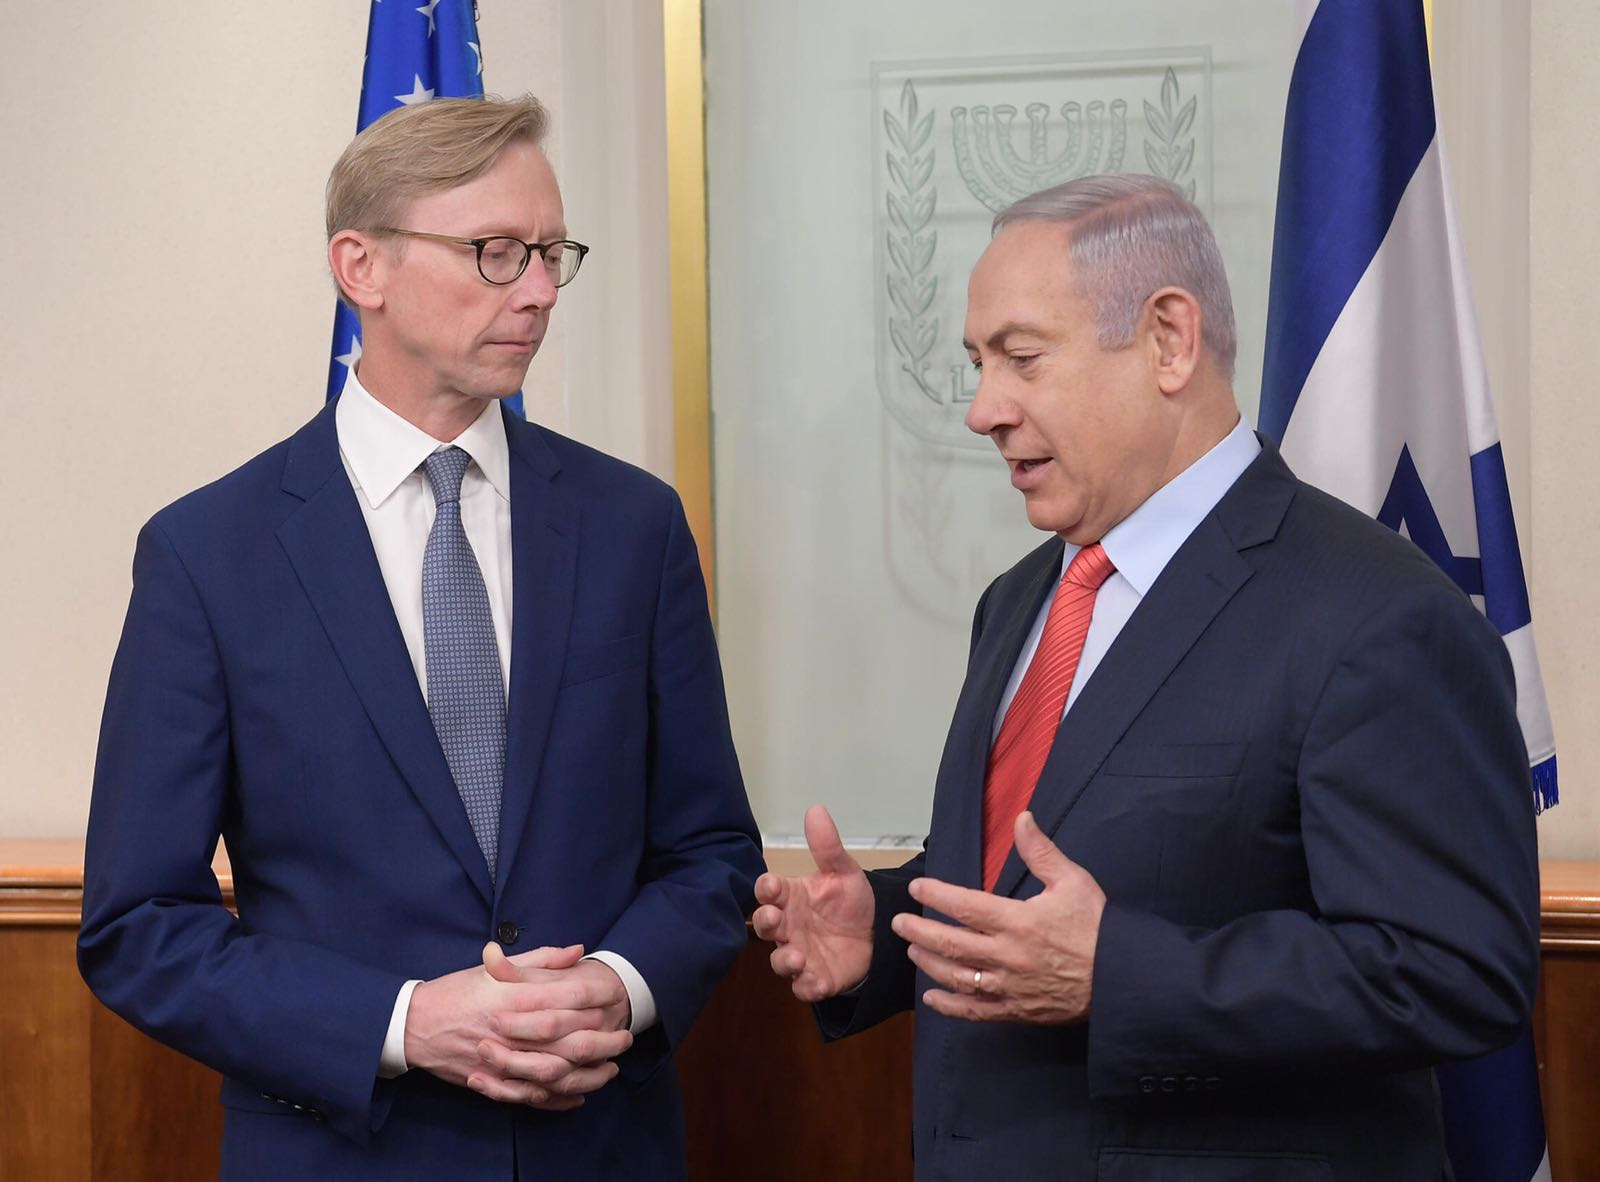 El primer ministro israelí Benjamin Netanyahu (izq) reunido con el enviado especial para Irán de EE.UU., Brian Hook. Foto: Twitter/Netanyahu